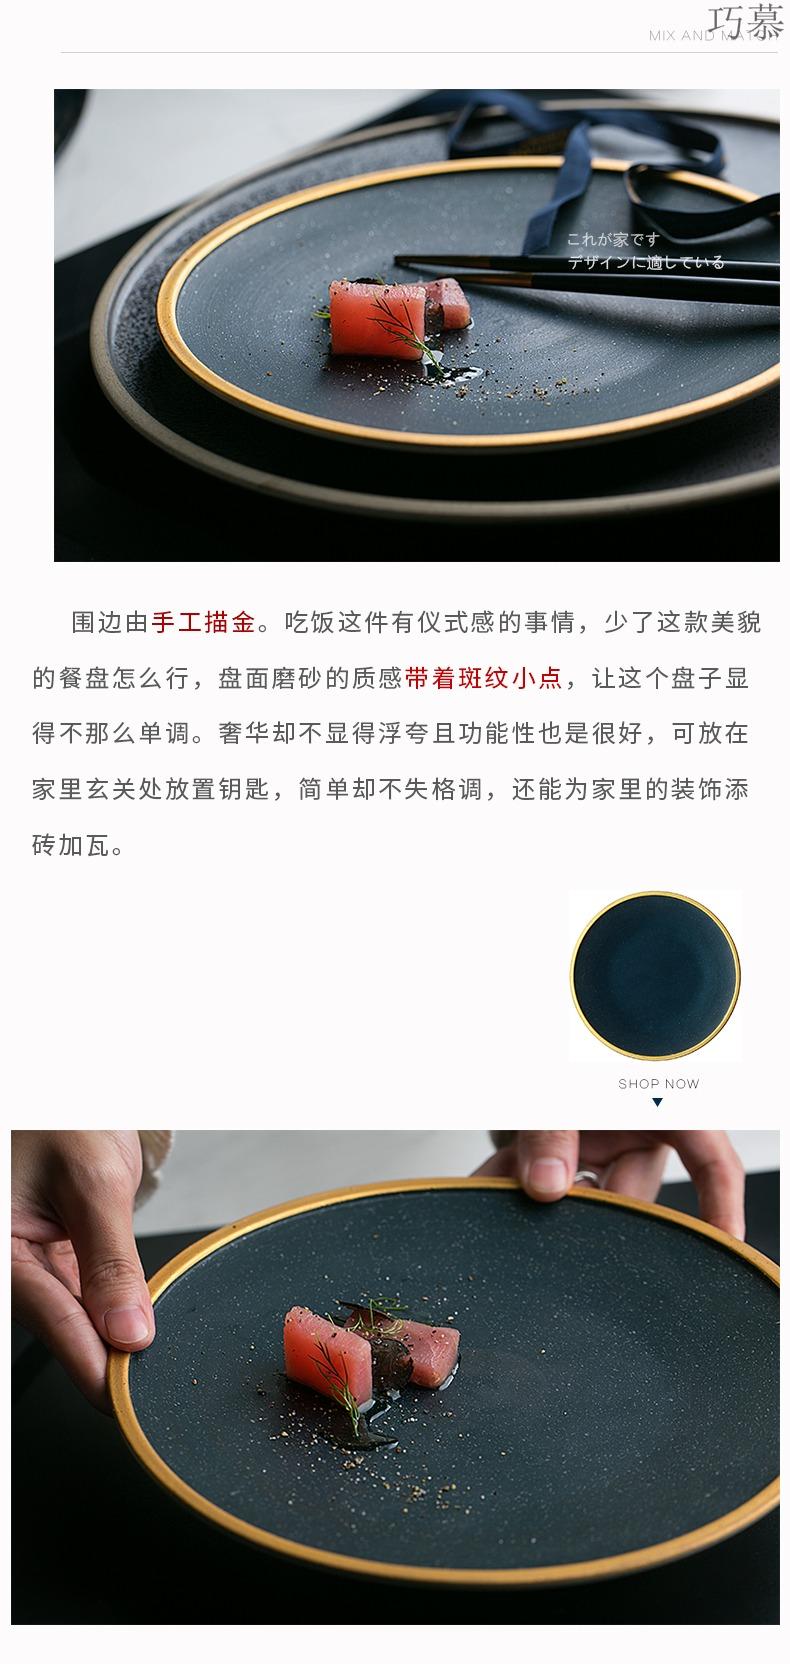 Qiao mu DY Nordic ceramics steak plate breakfast tray plates dessert plate creative home paint jewelry set